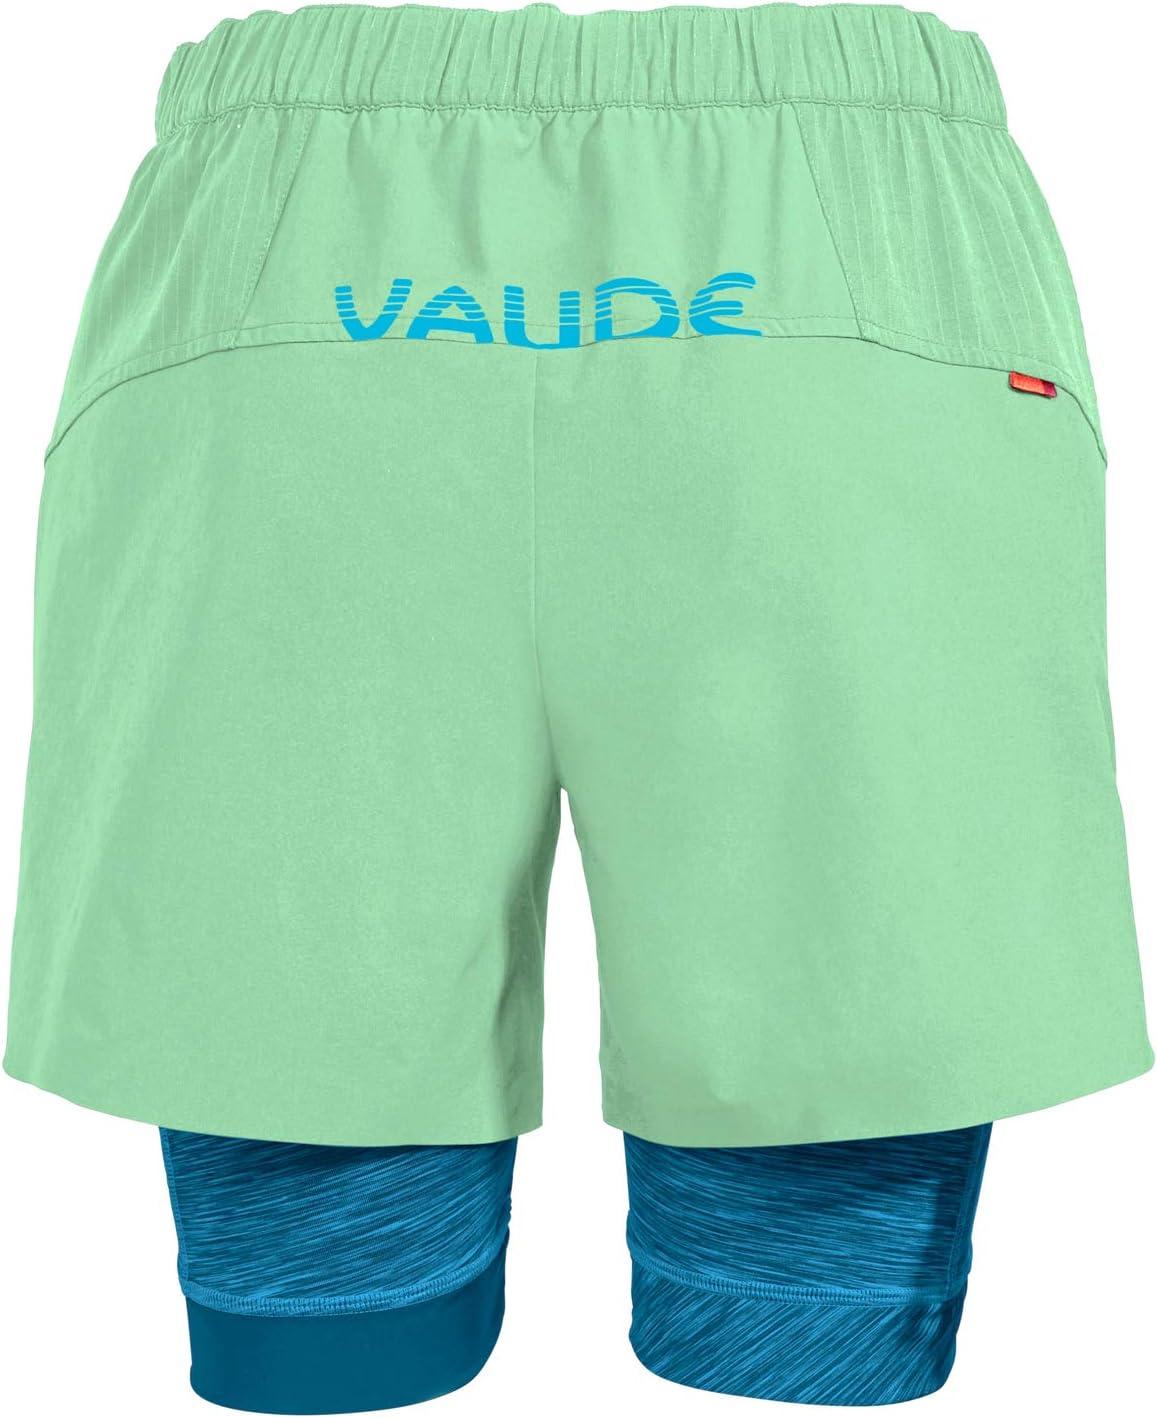 Womens Altissimi Shorts VAUDE Womens Altissimi Shorts Pantalon Femme